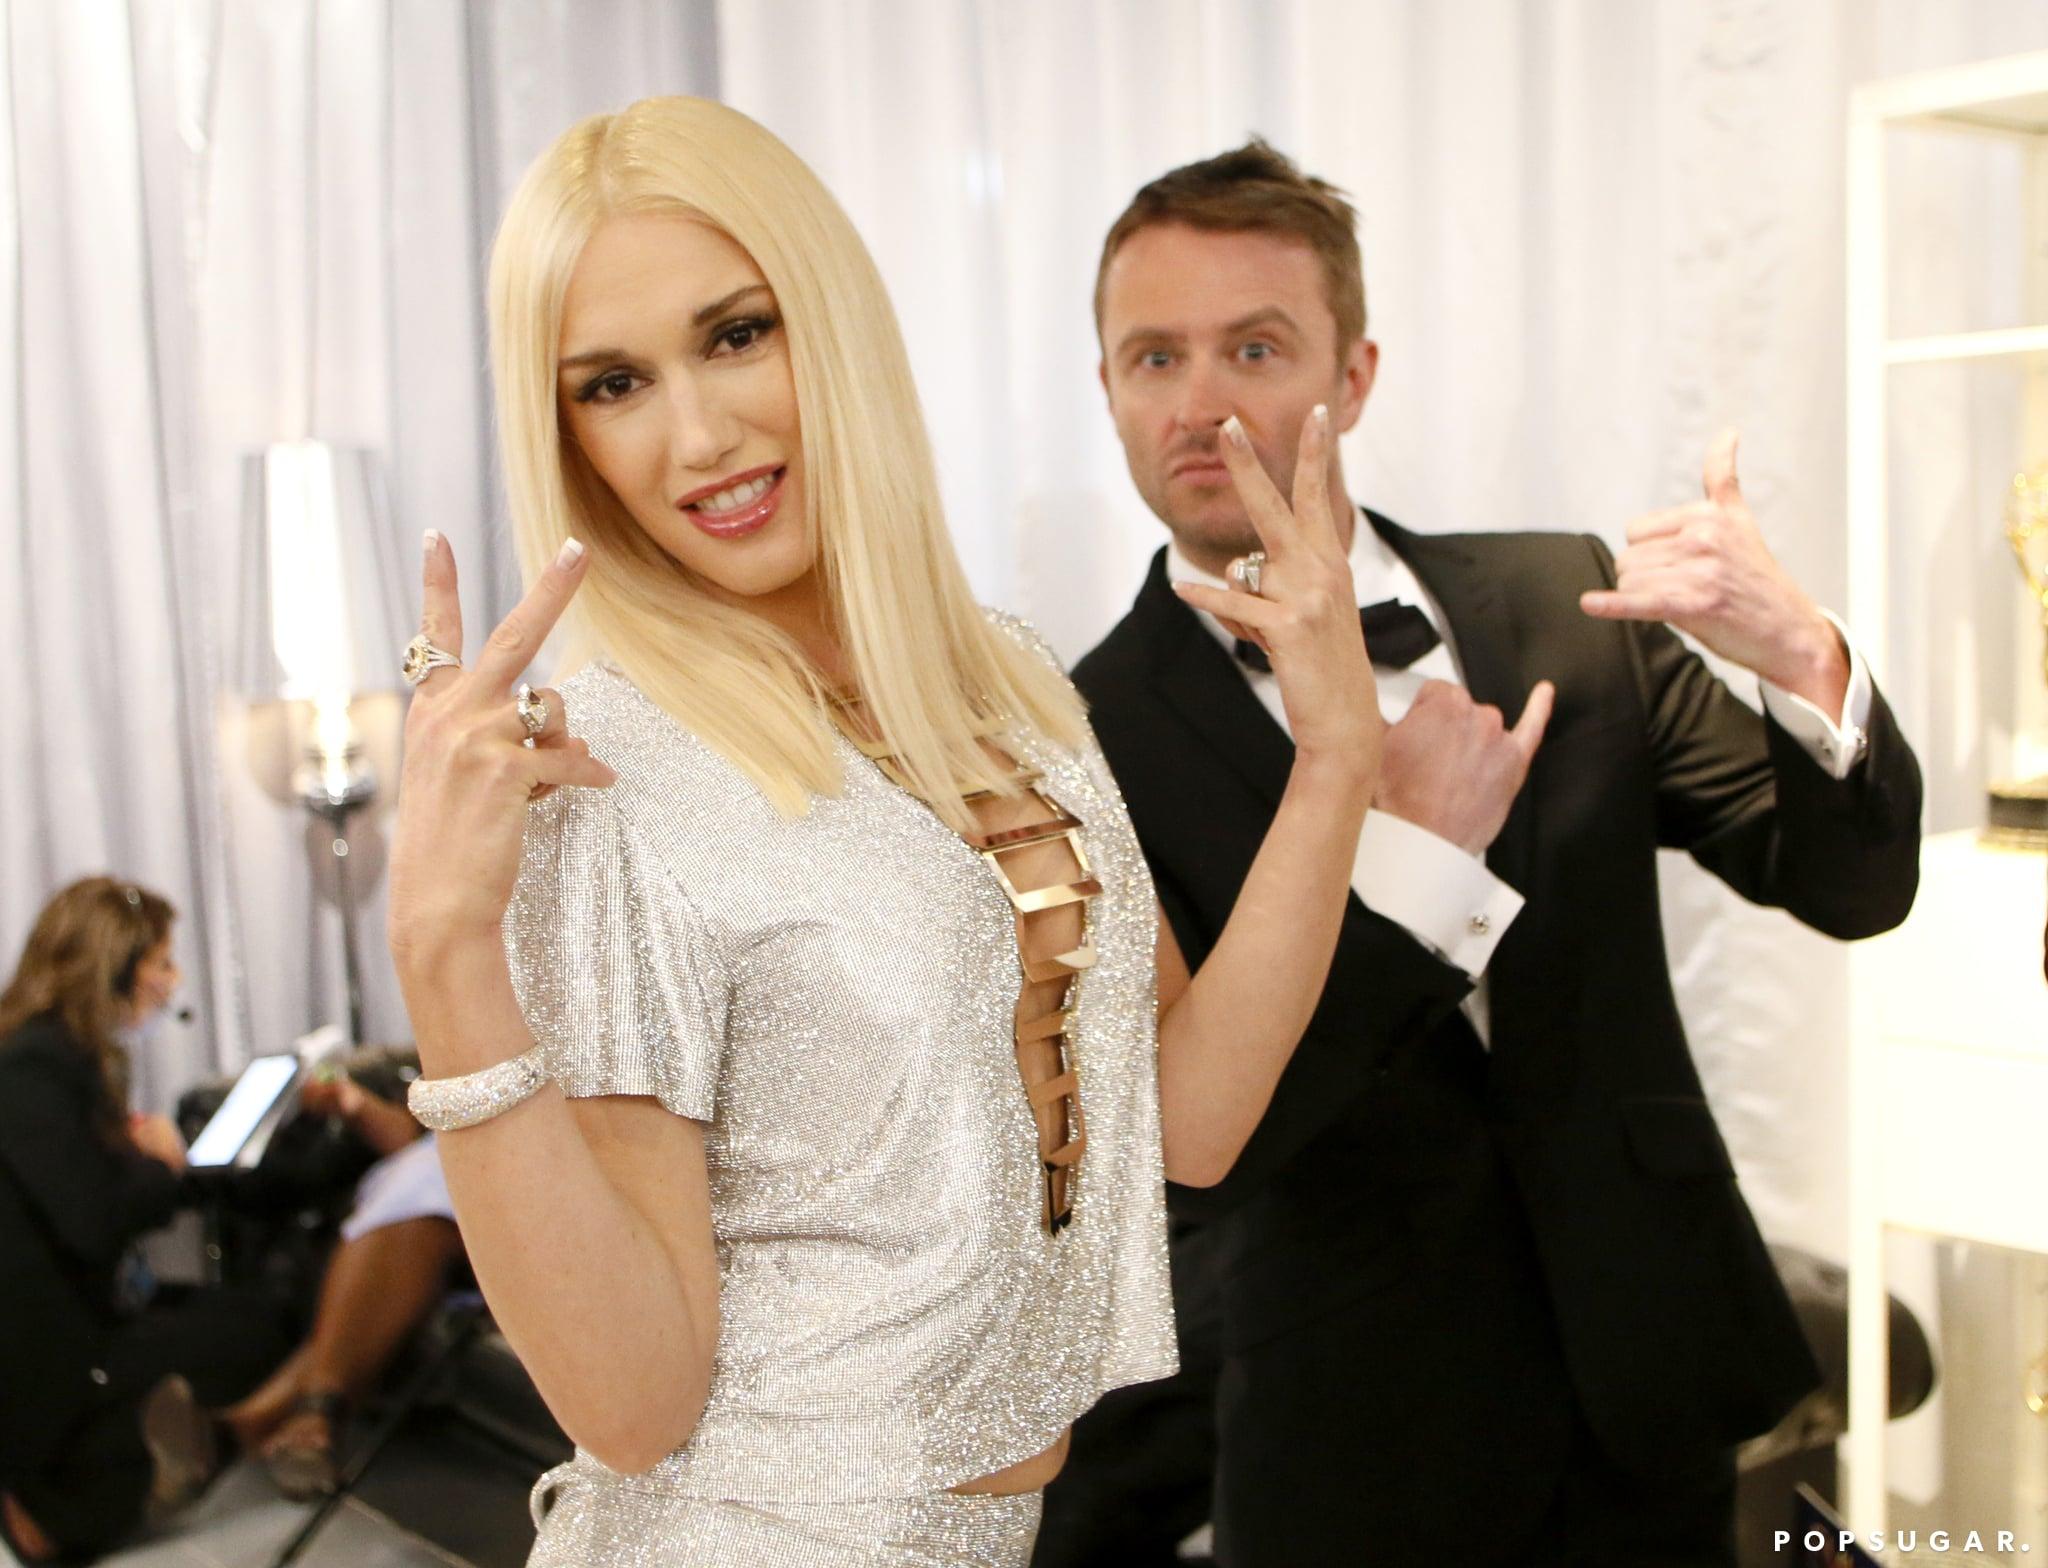 Gwen Stefani let loose with Chris Hardwick backstage.